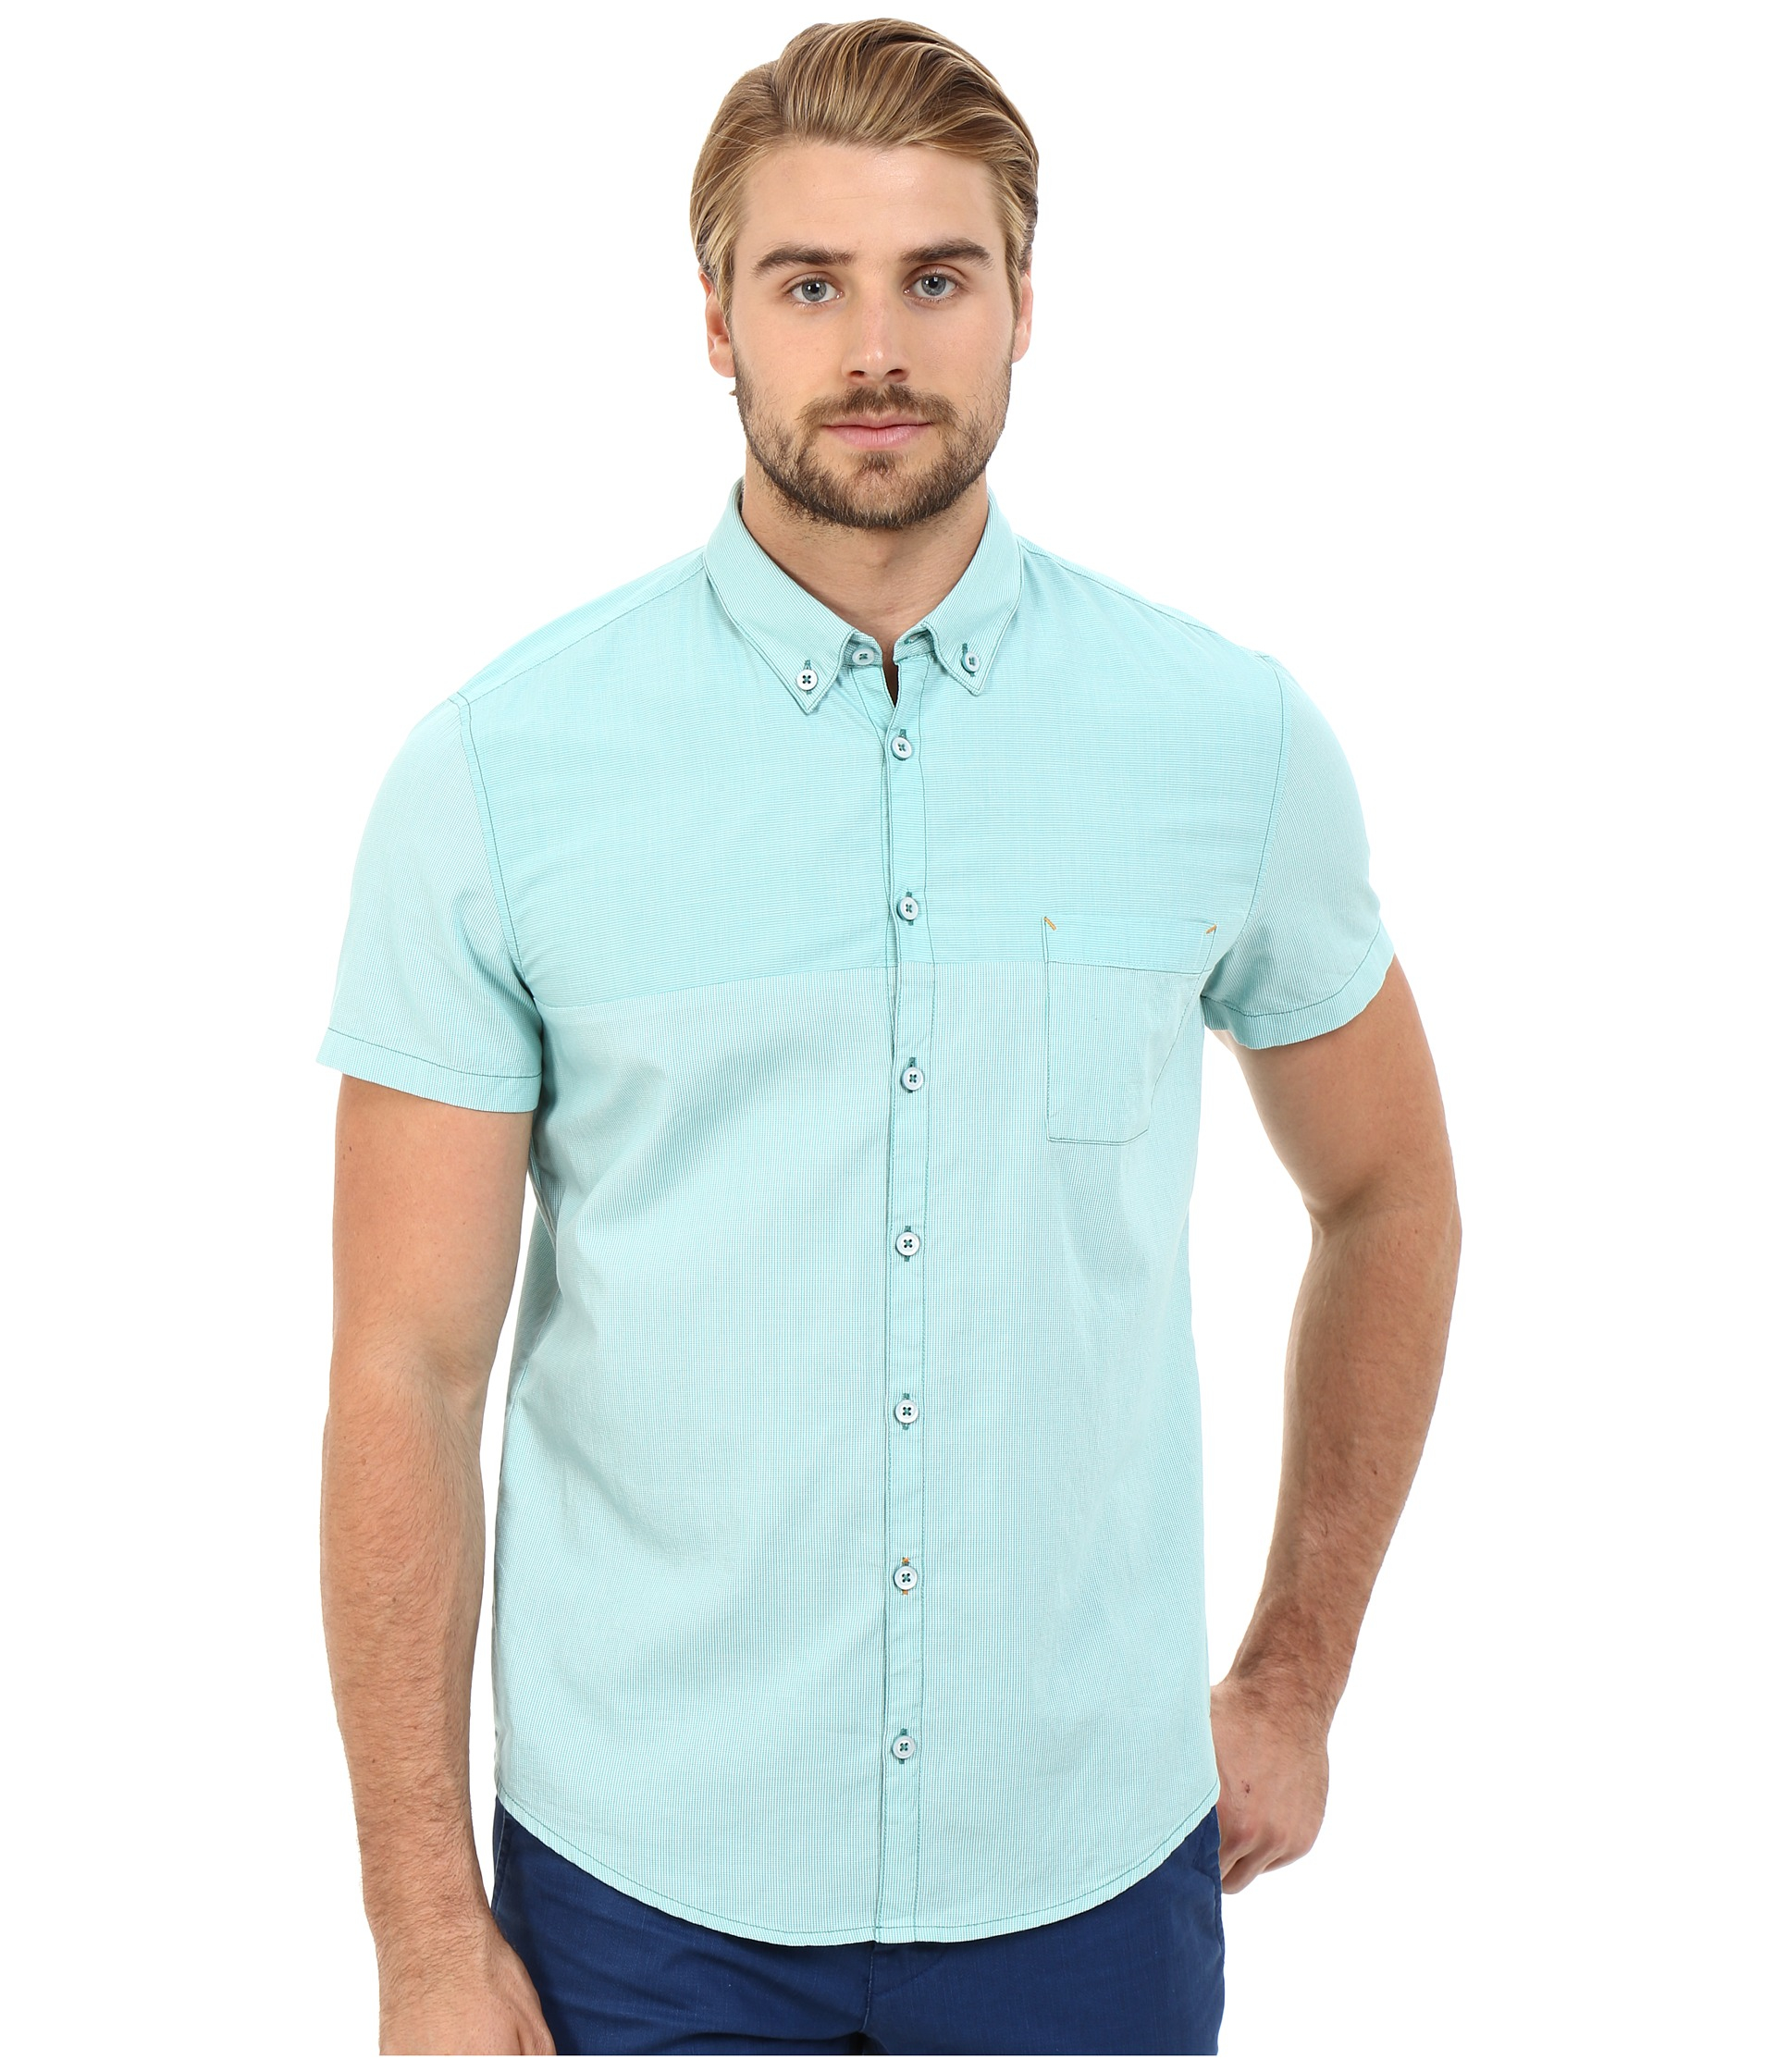 Boss orange Erollese Button Down Shirt 10187168 01 in ...